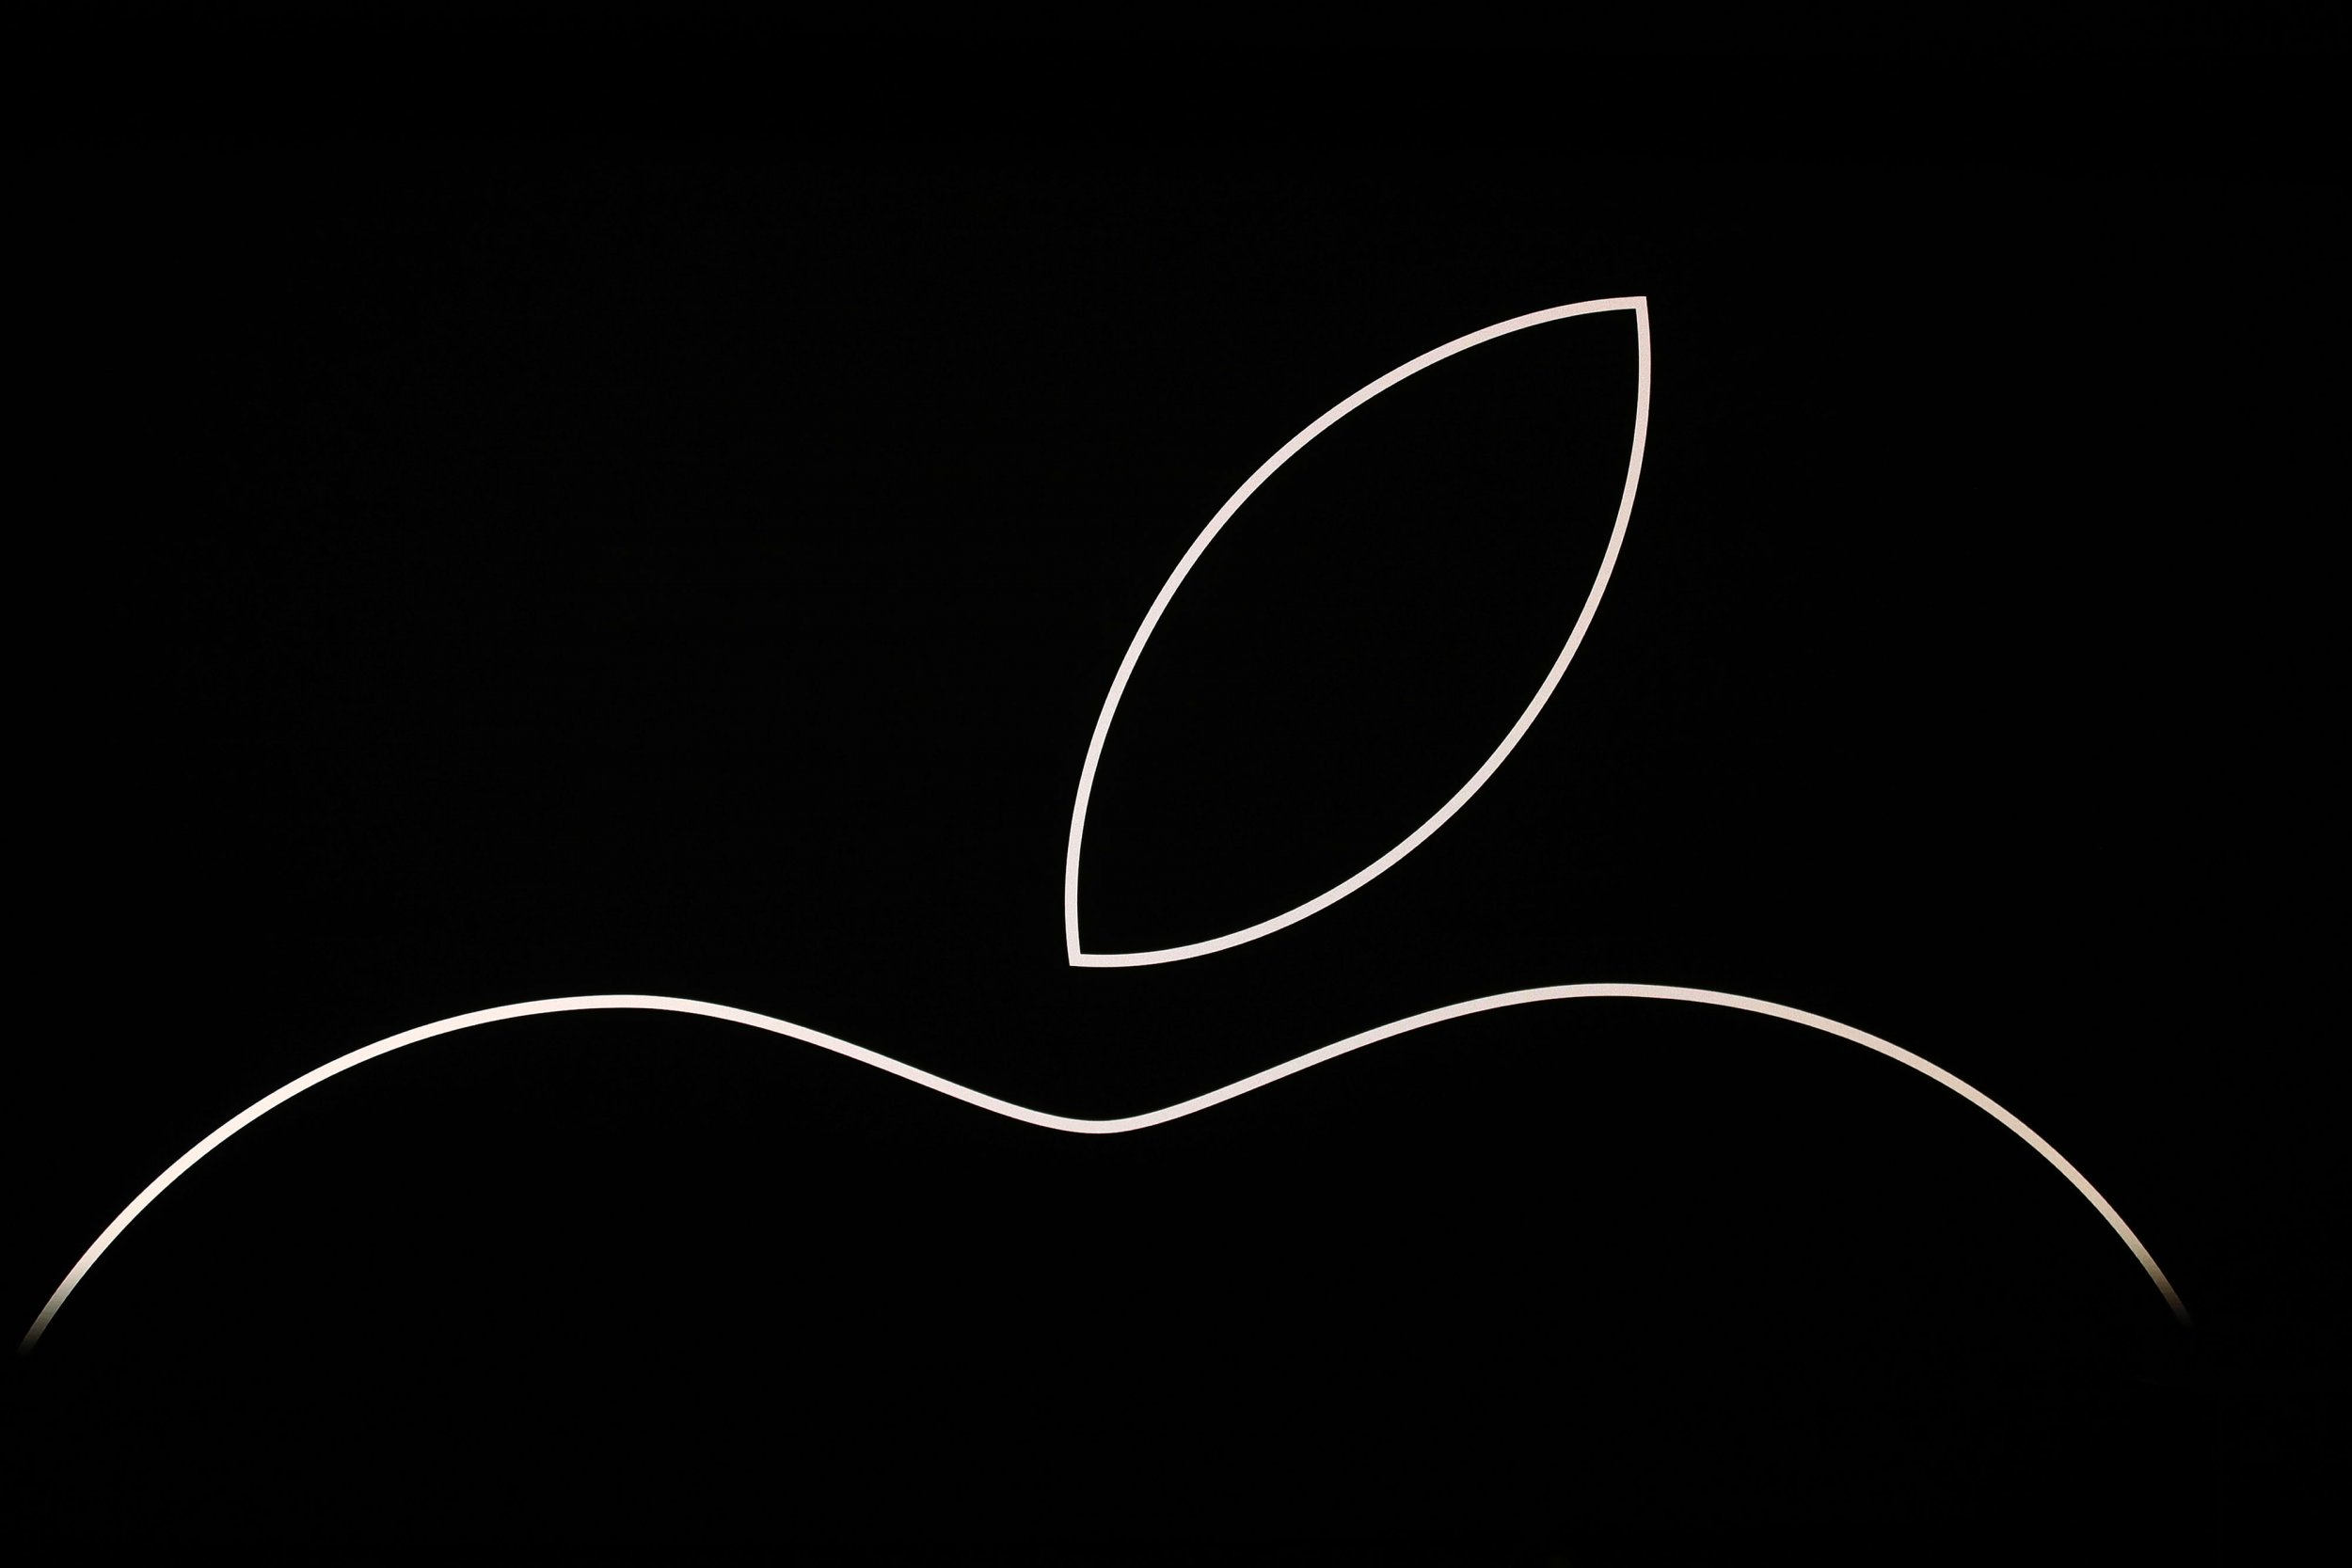 apple logo on stage